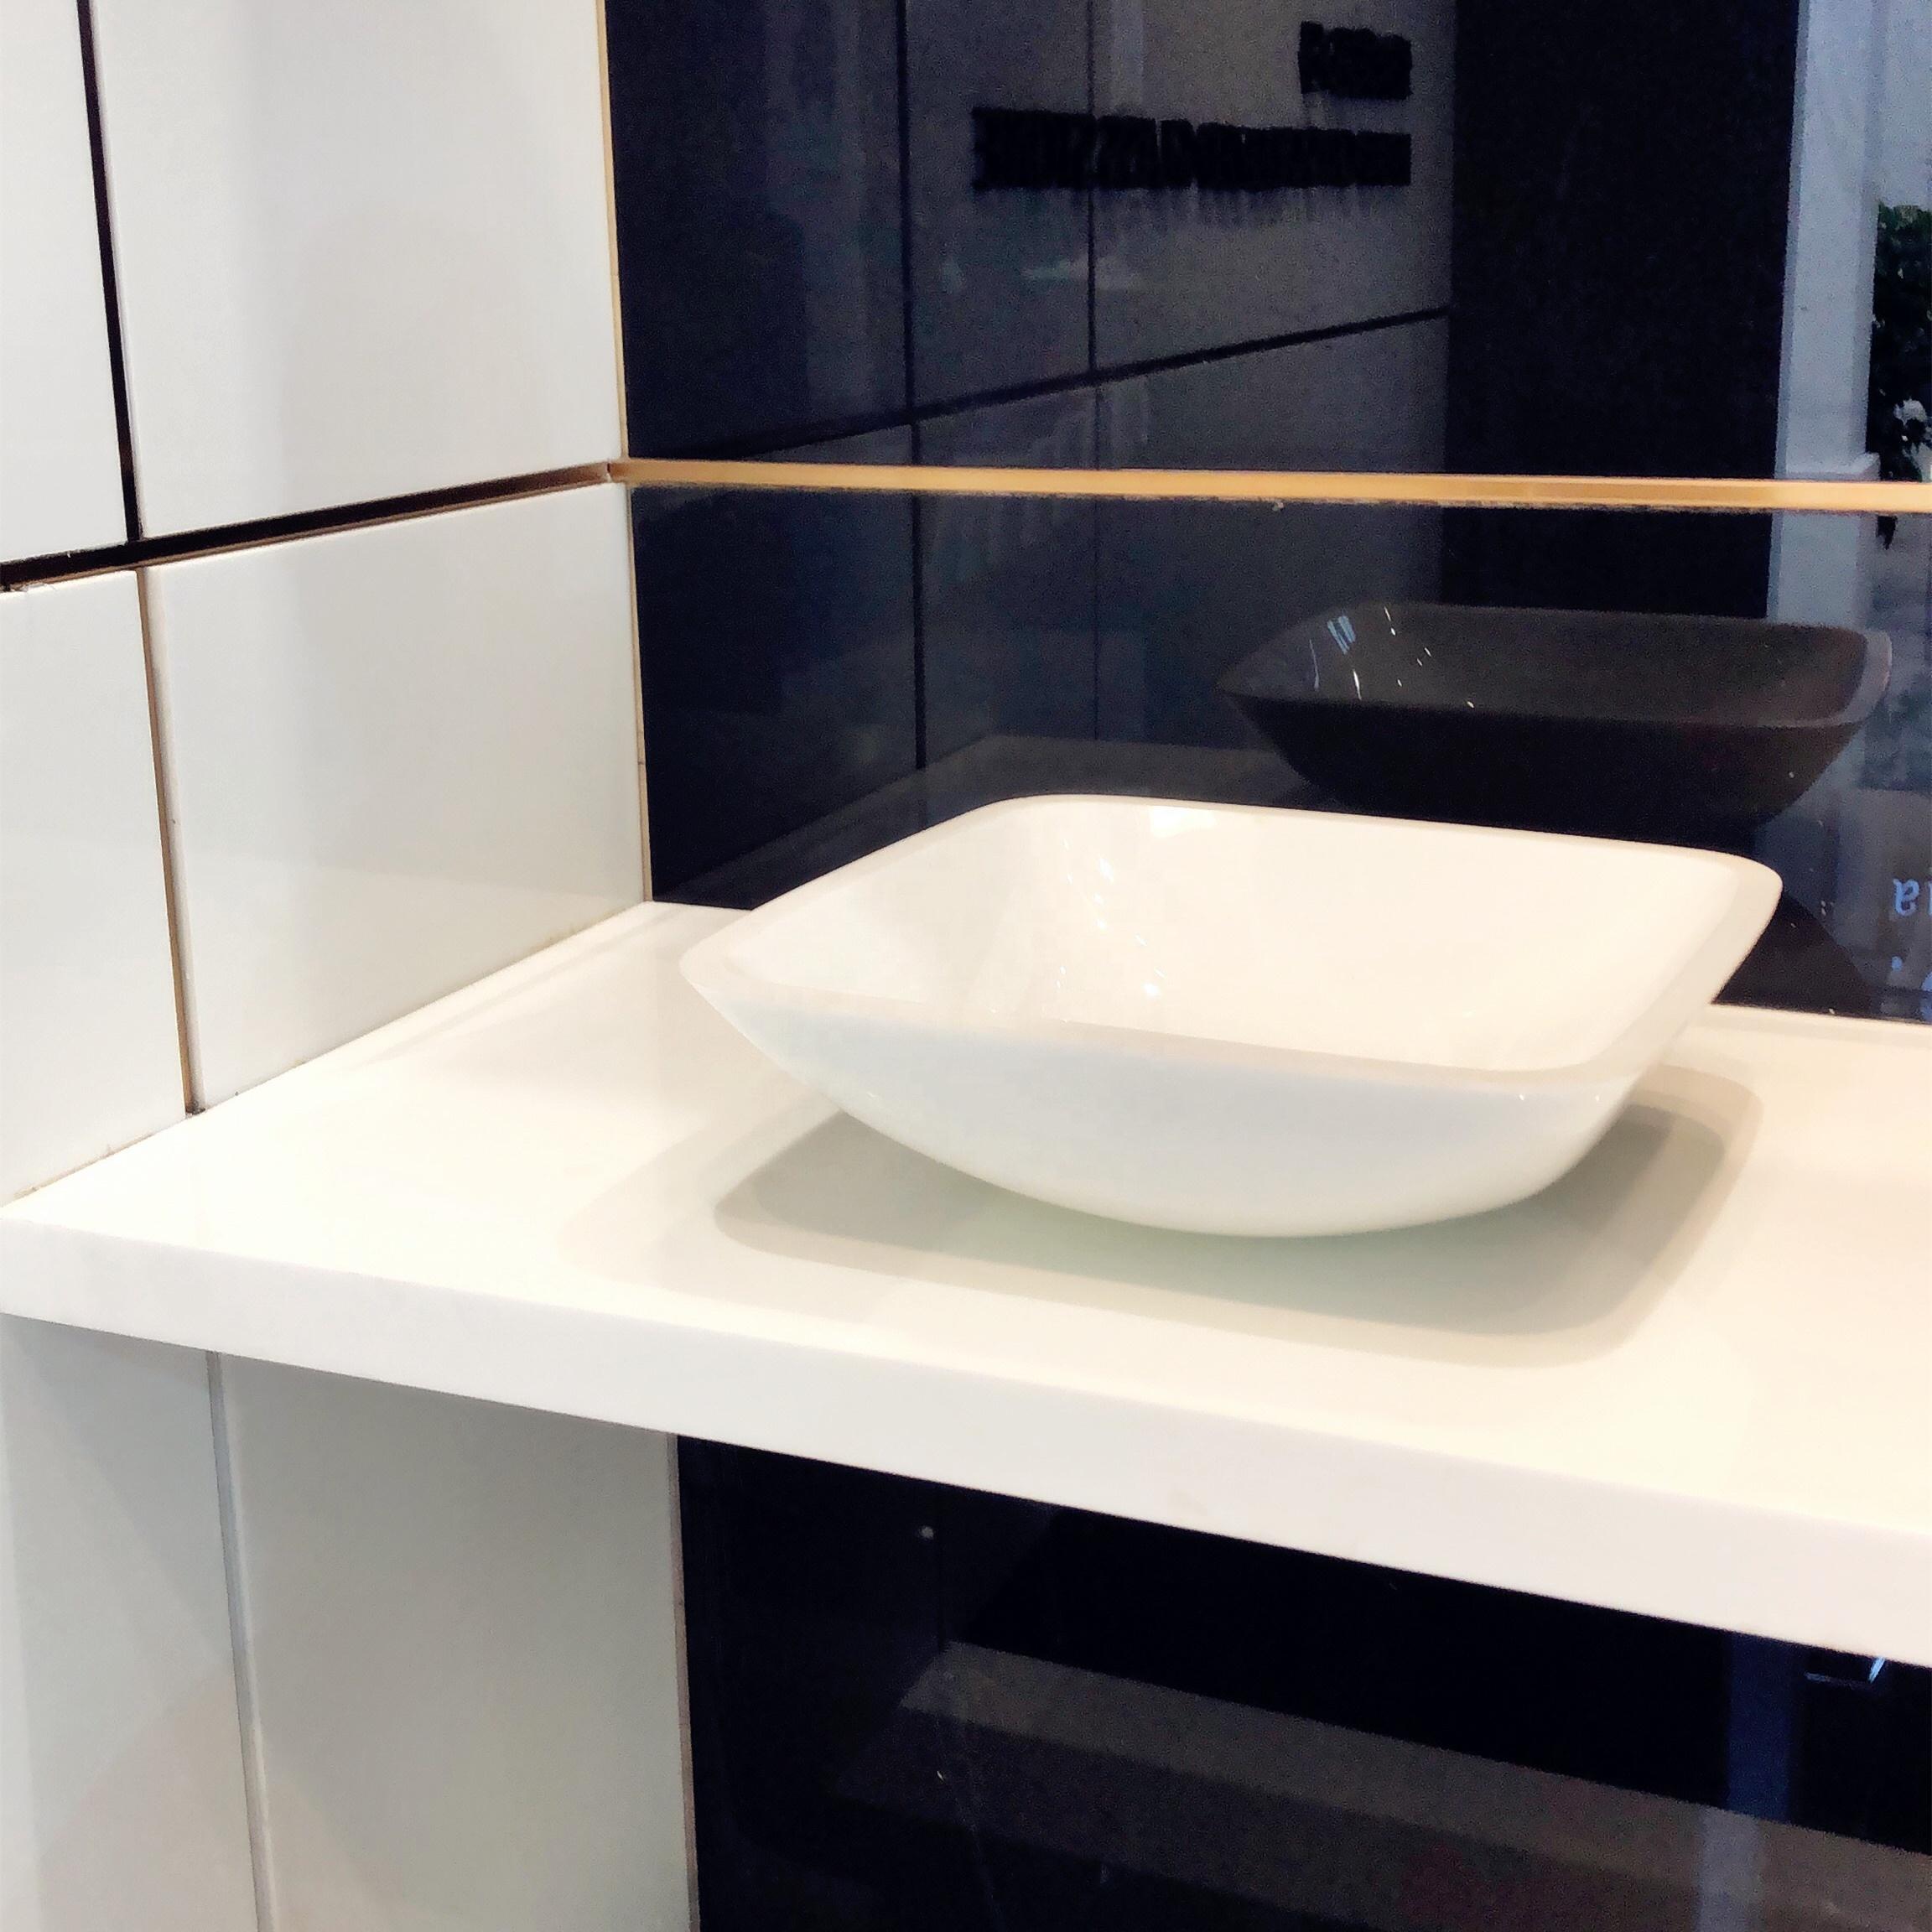 golden phoenix nano glass pure white artificial stone sinks buy nano crystal glass bathroom vanities and sinks nano white wash basins product on